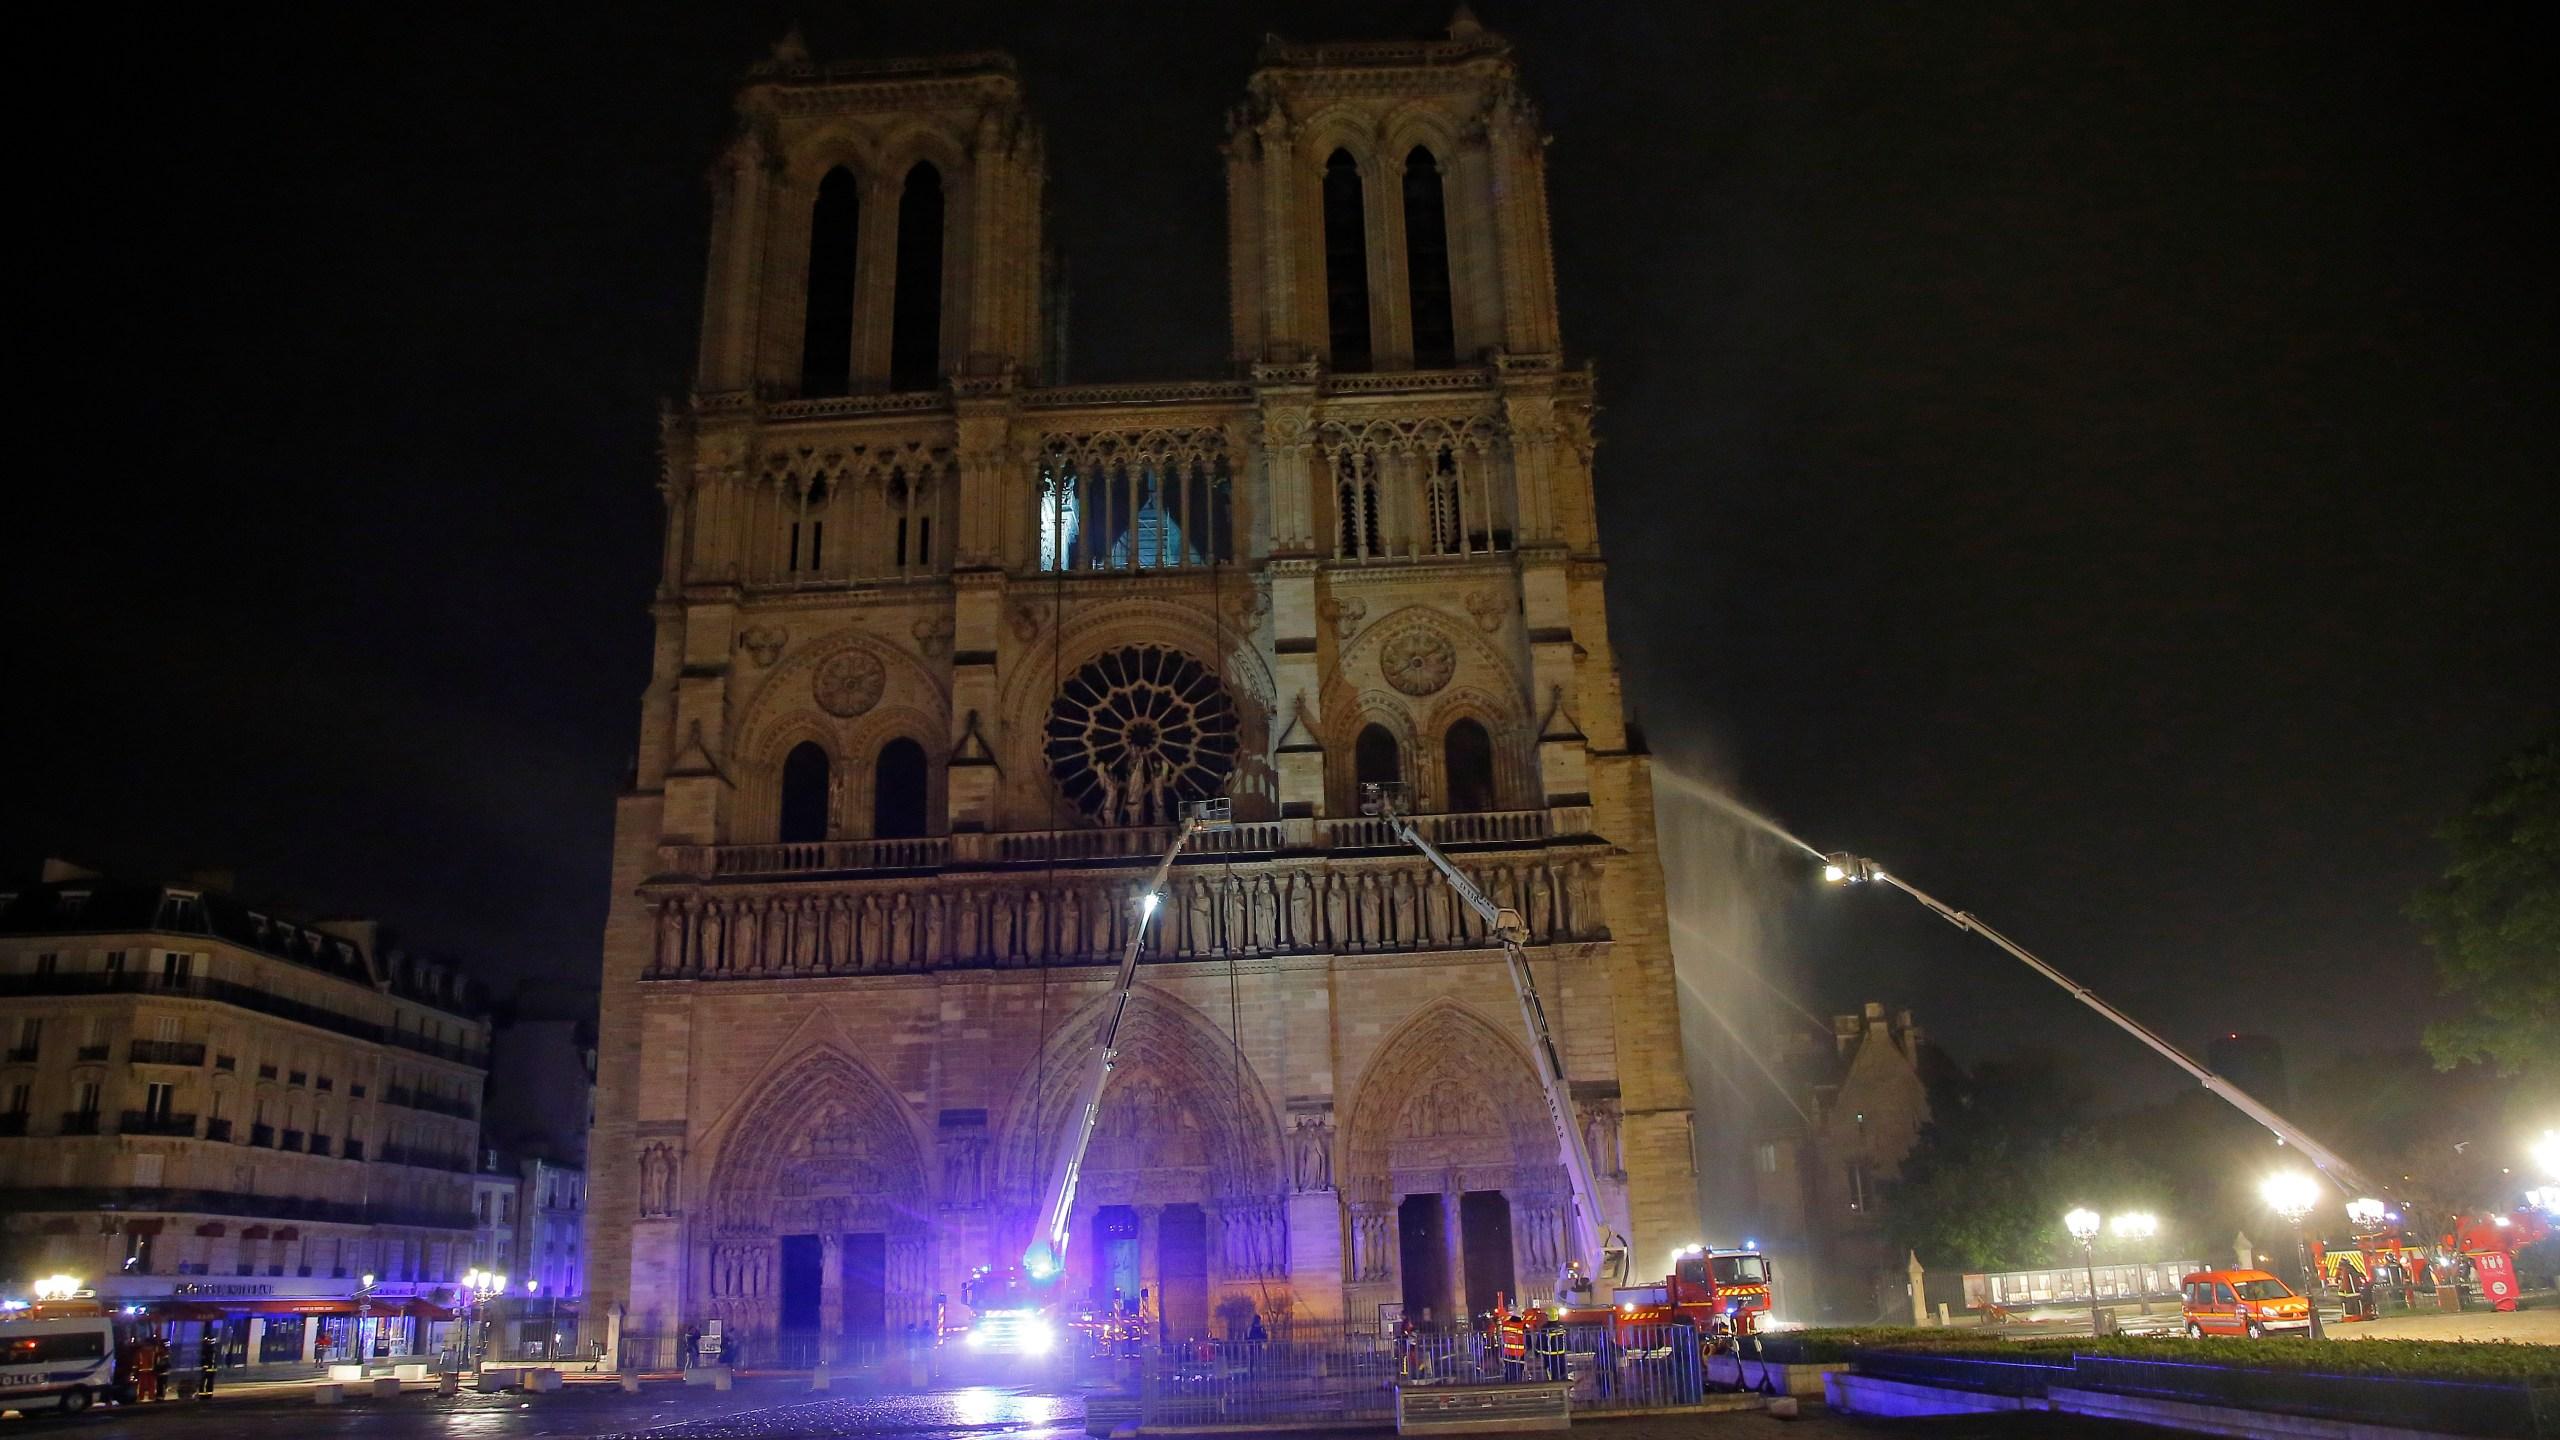 France_Notre_Dame_Fire_81715-159532.jpg81629159